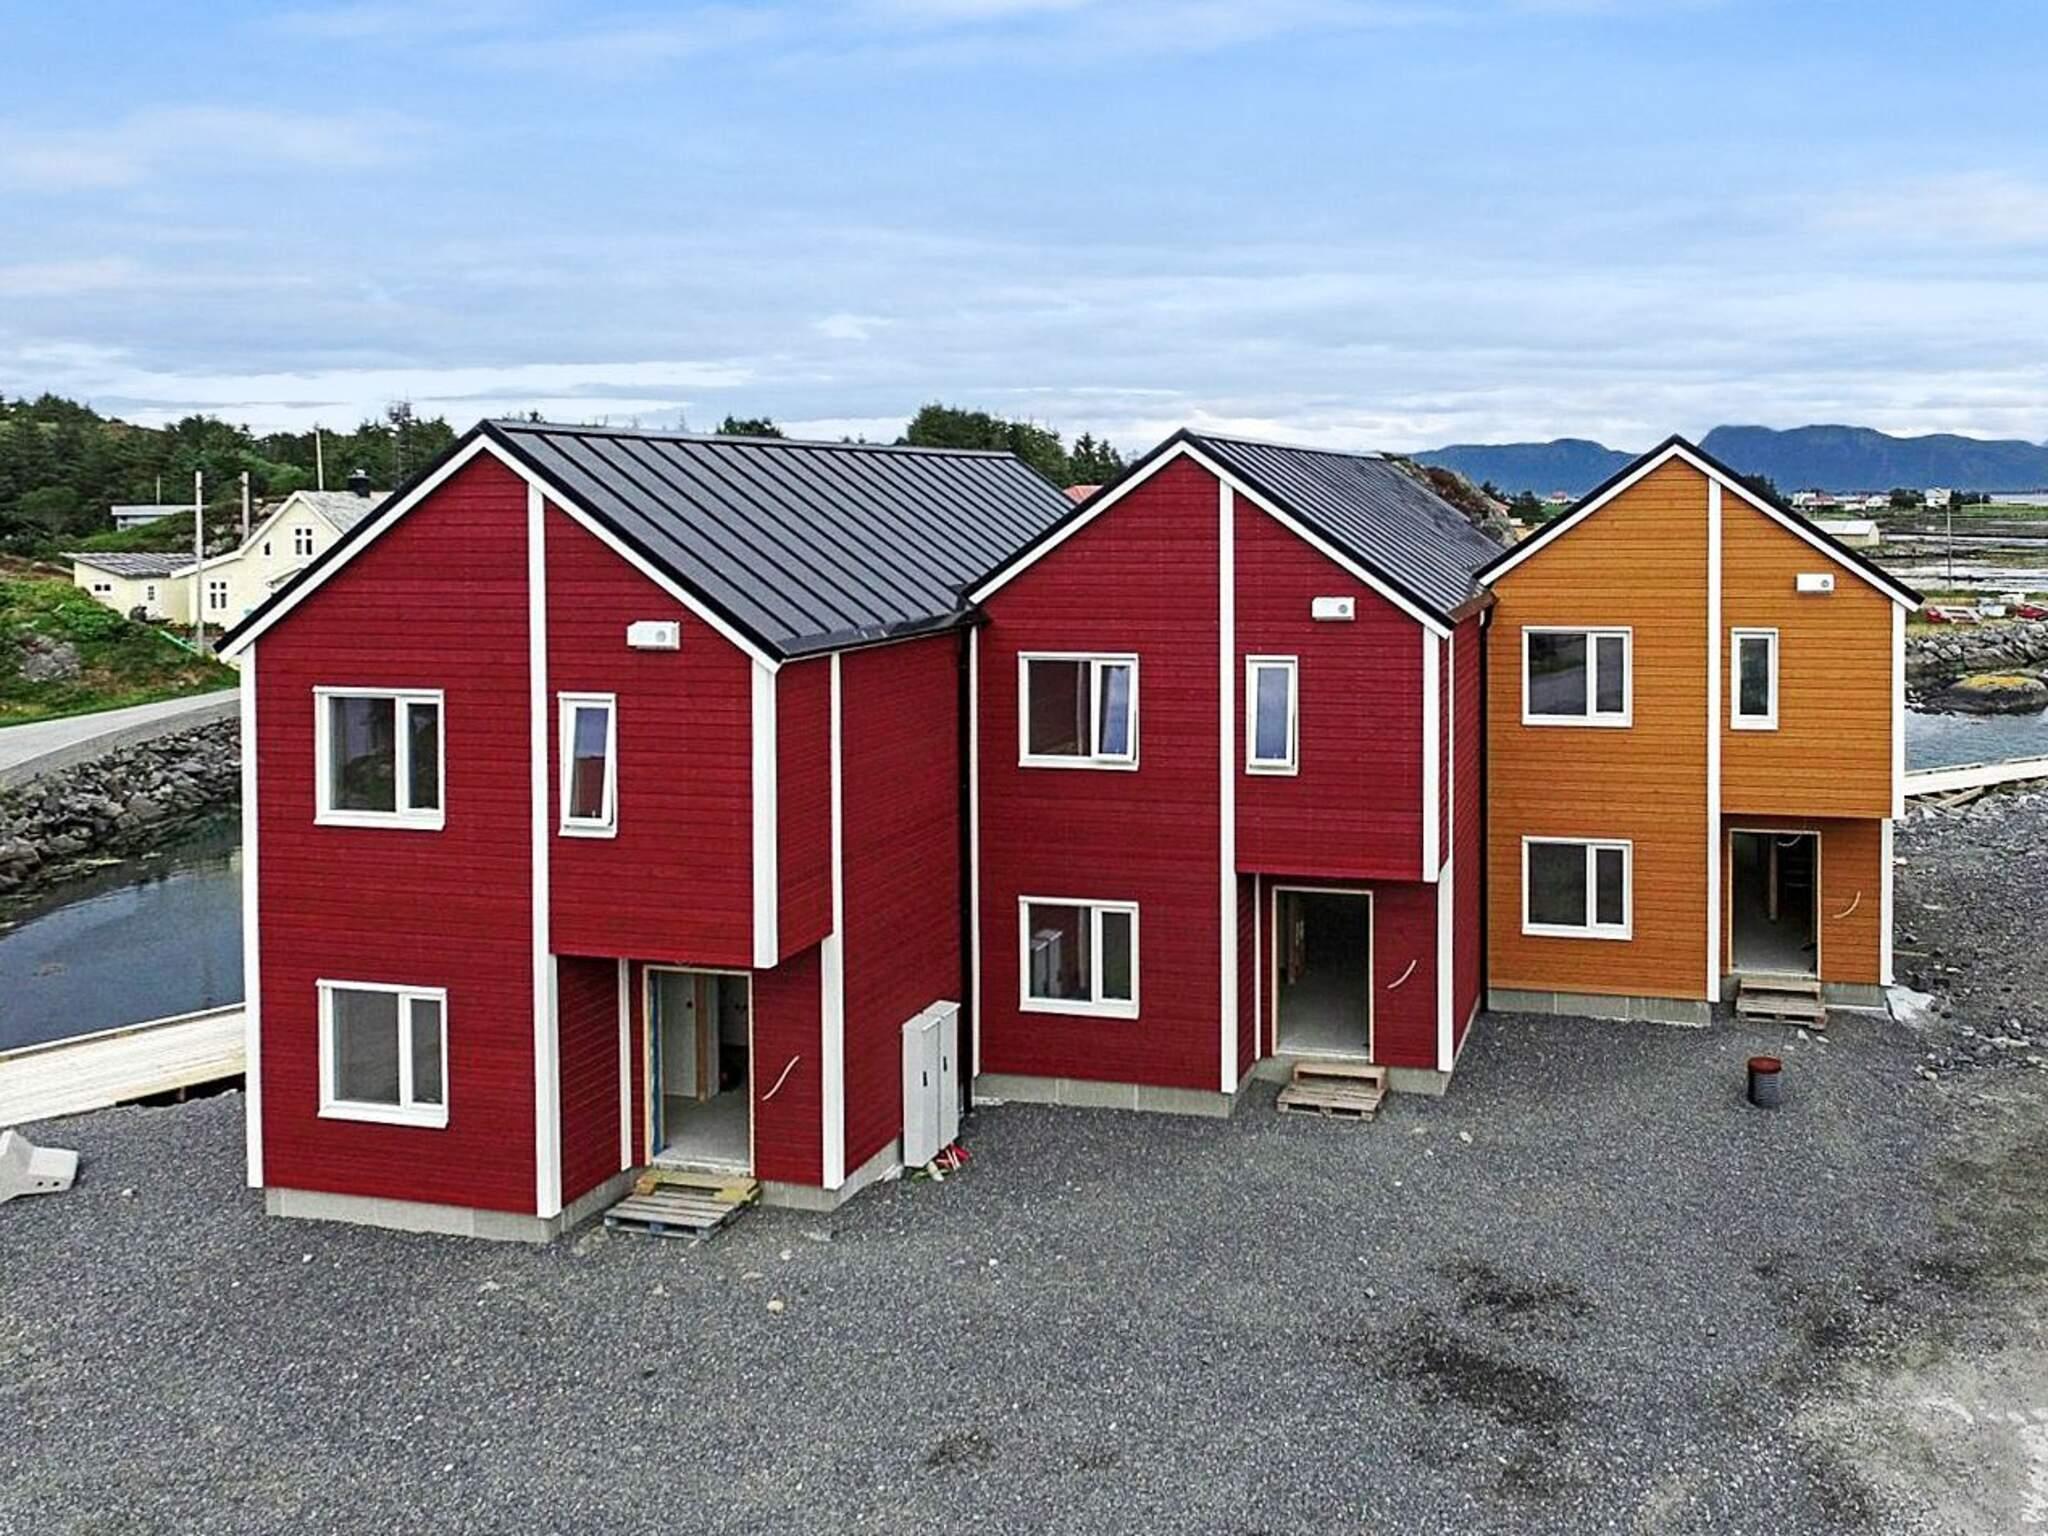 Ferienhaus Sandøy (2789401), Sandøy, More - Romsdal, Westnorwegen, Norwegen, Bild 19